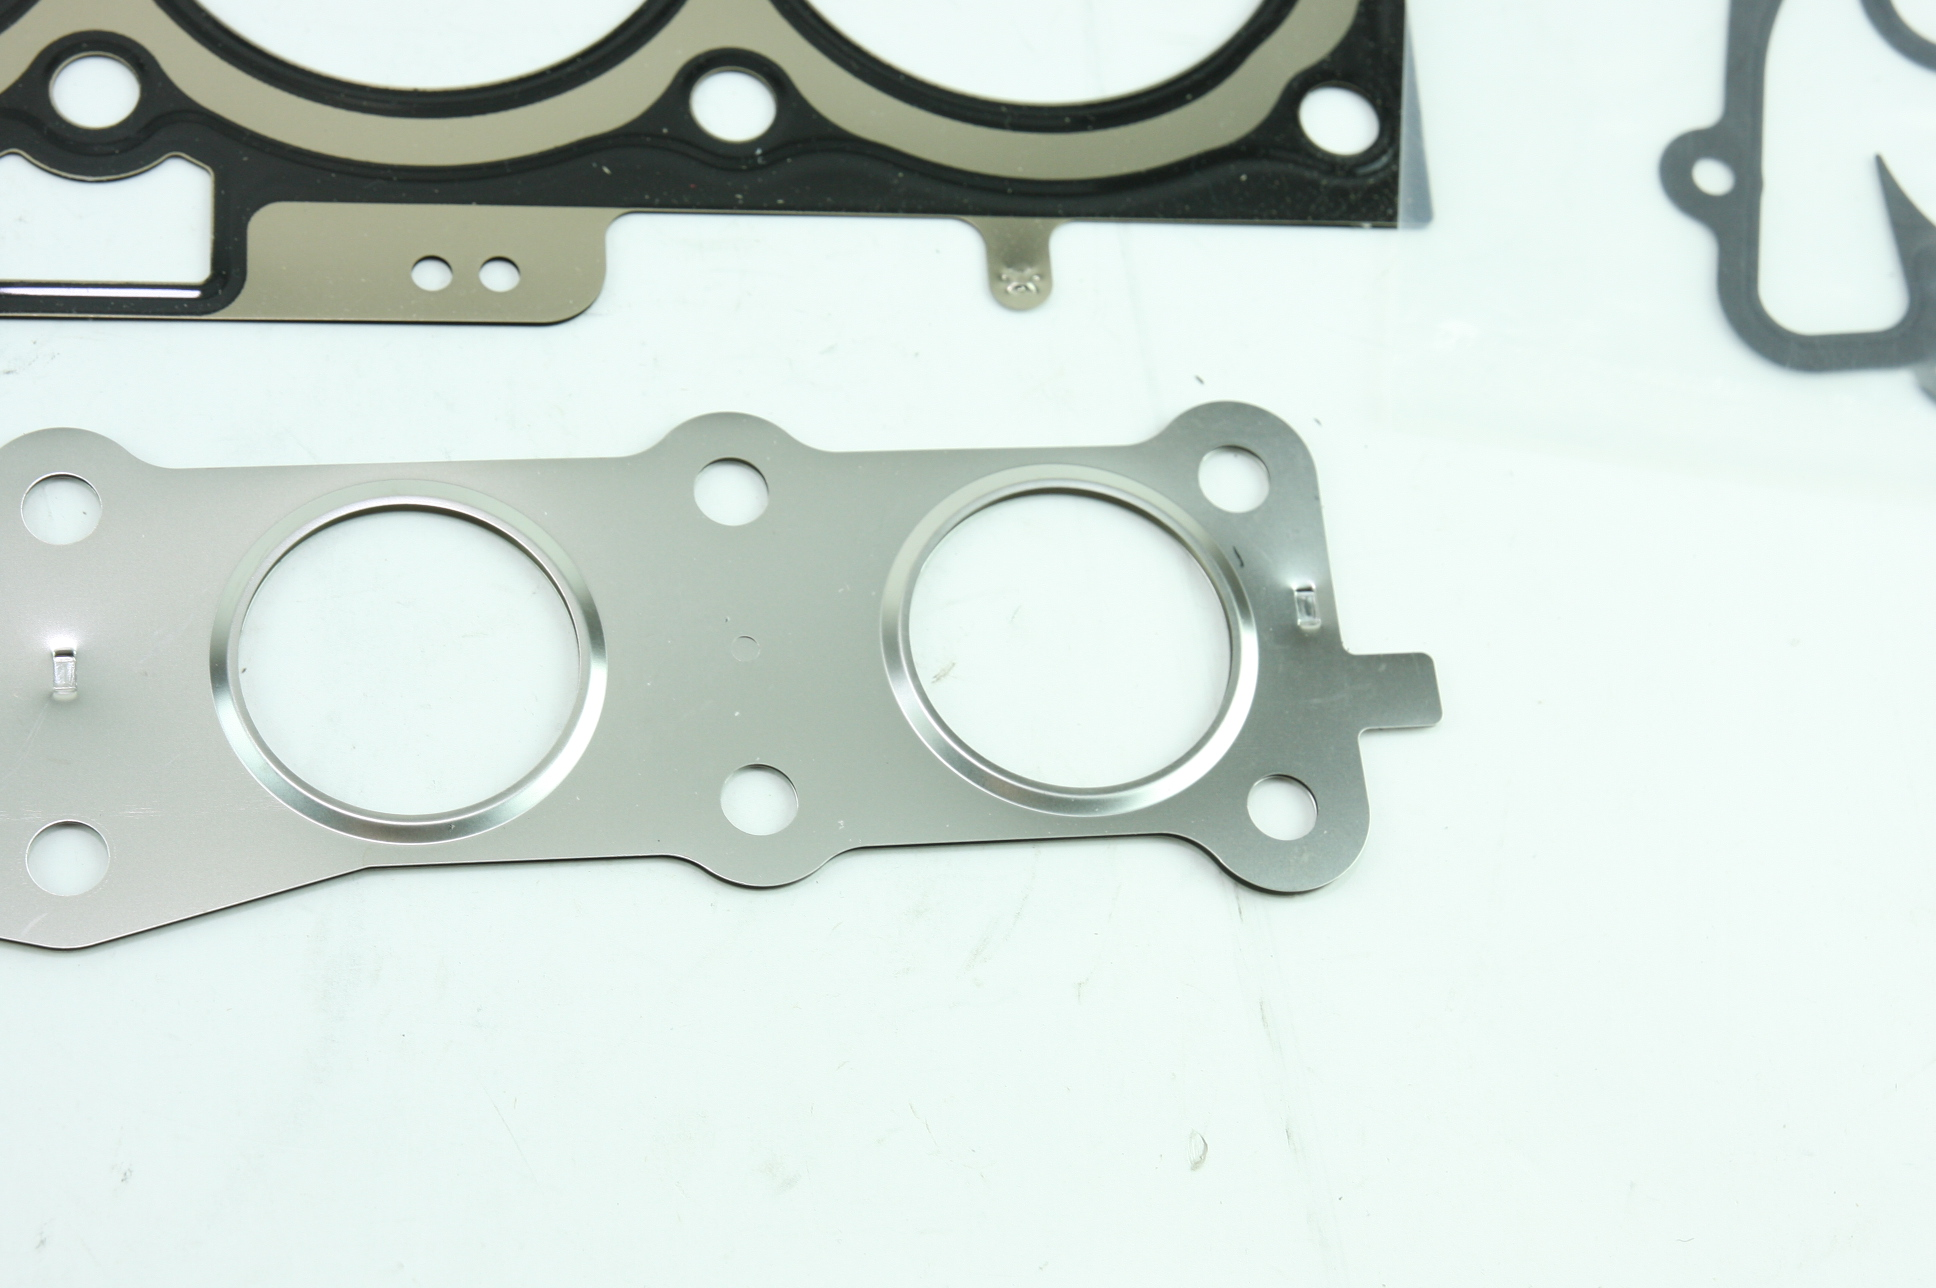 ** New Genuine Hyundai 209102GK03 Full Engine Overhaul Gasket Set Free Shipping - image 10